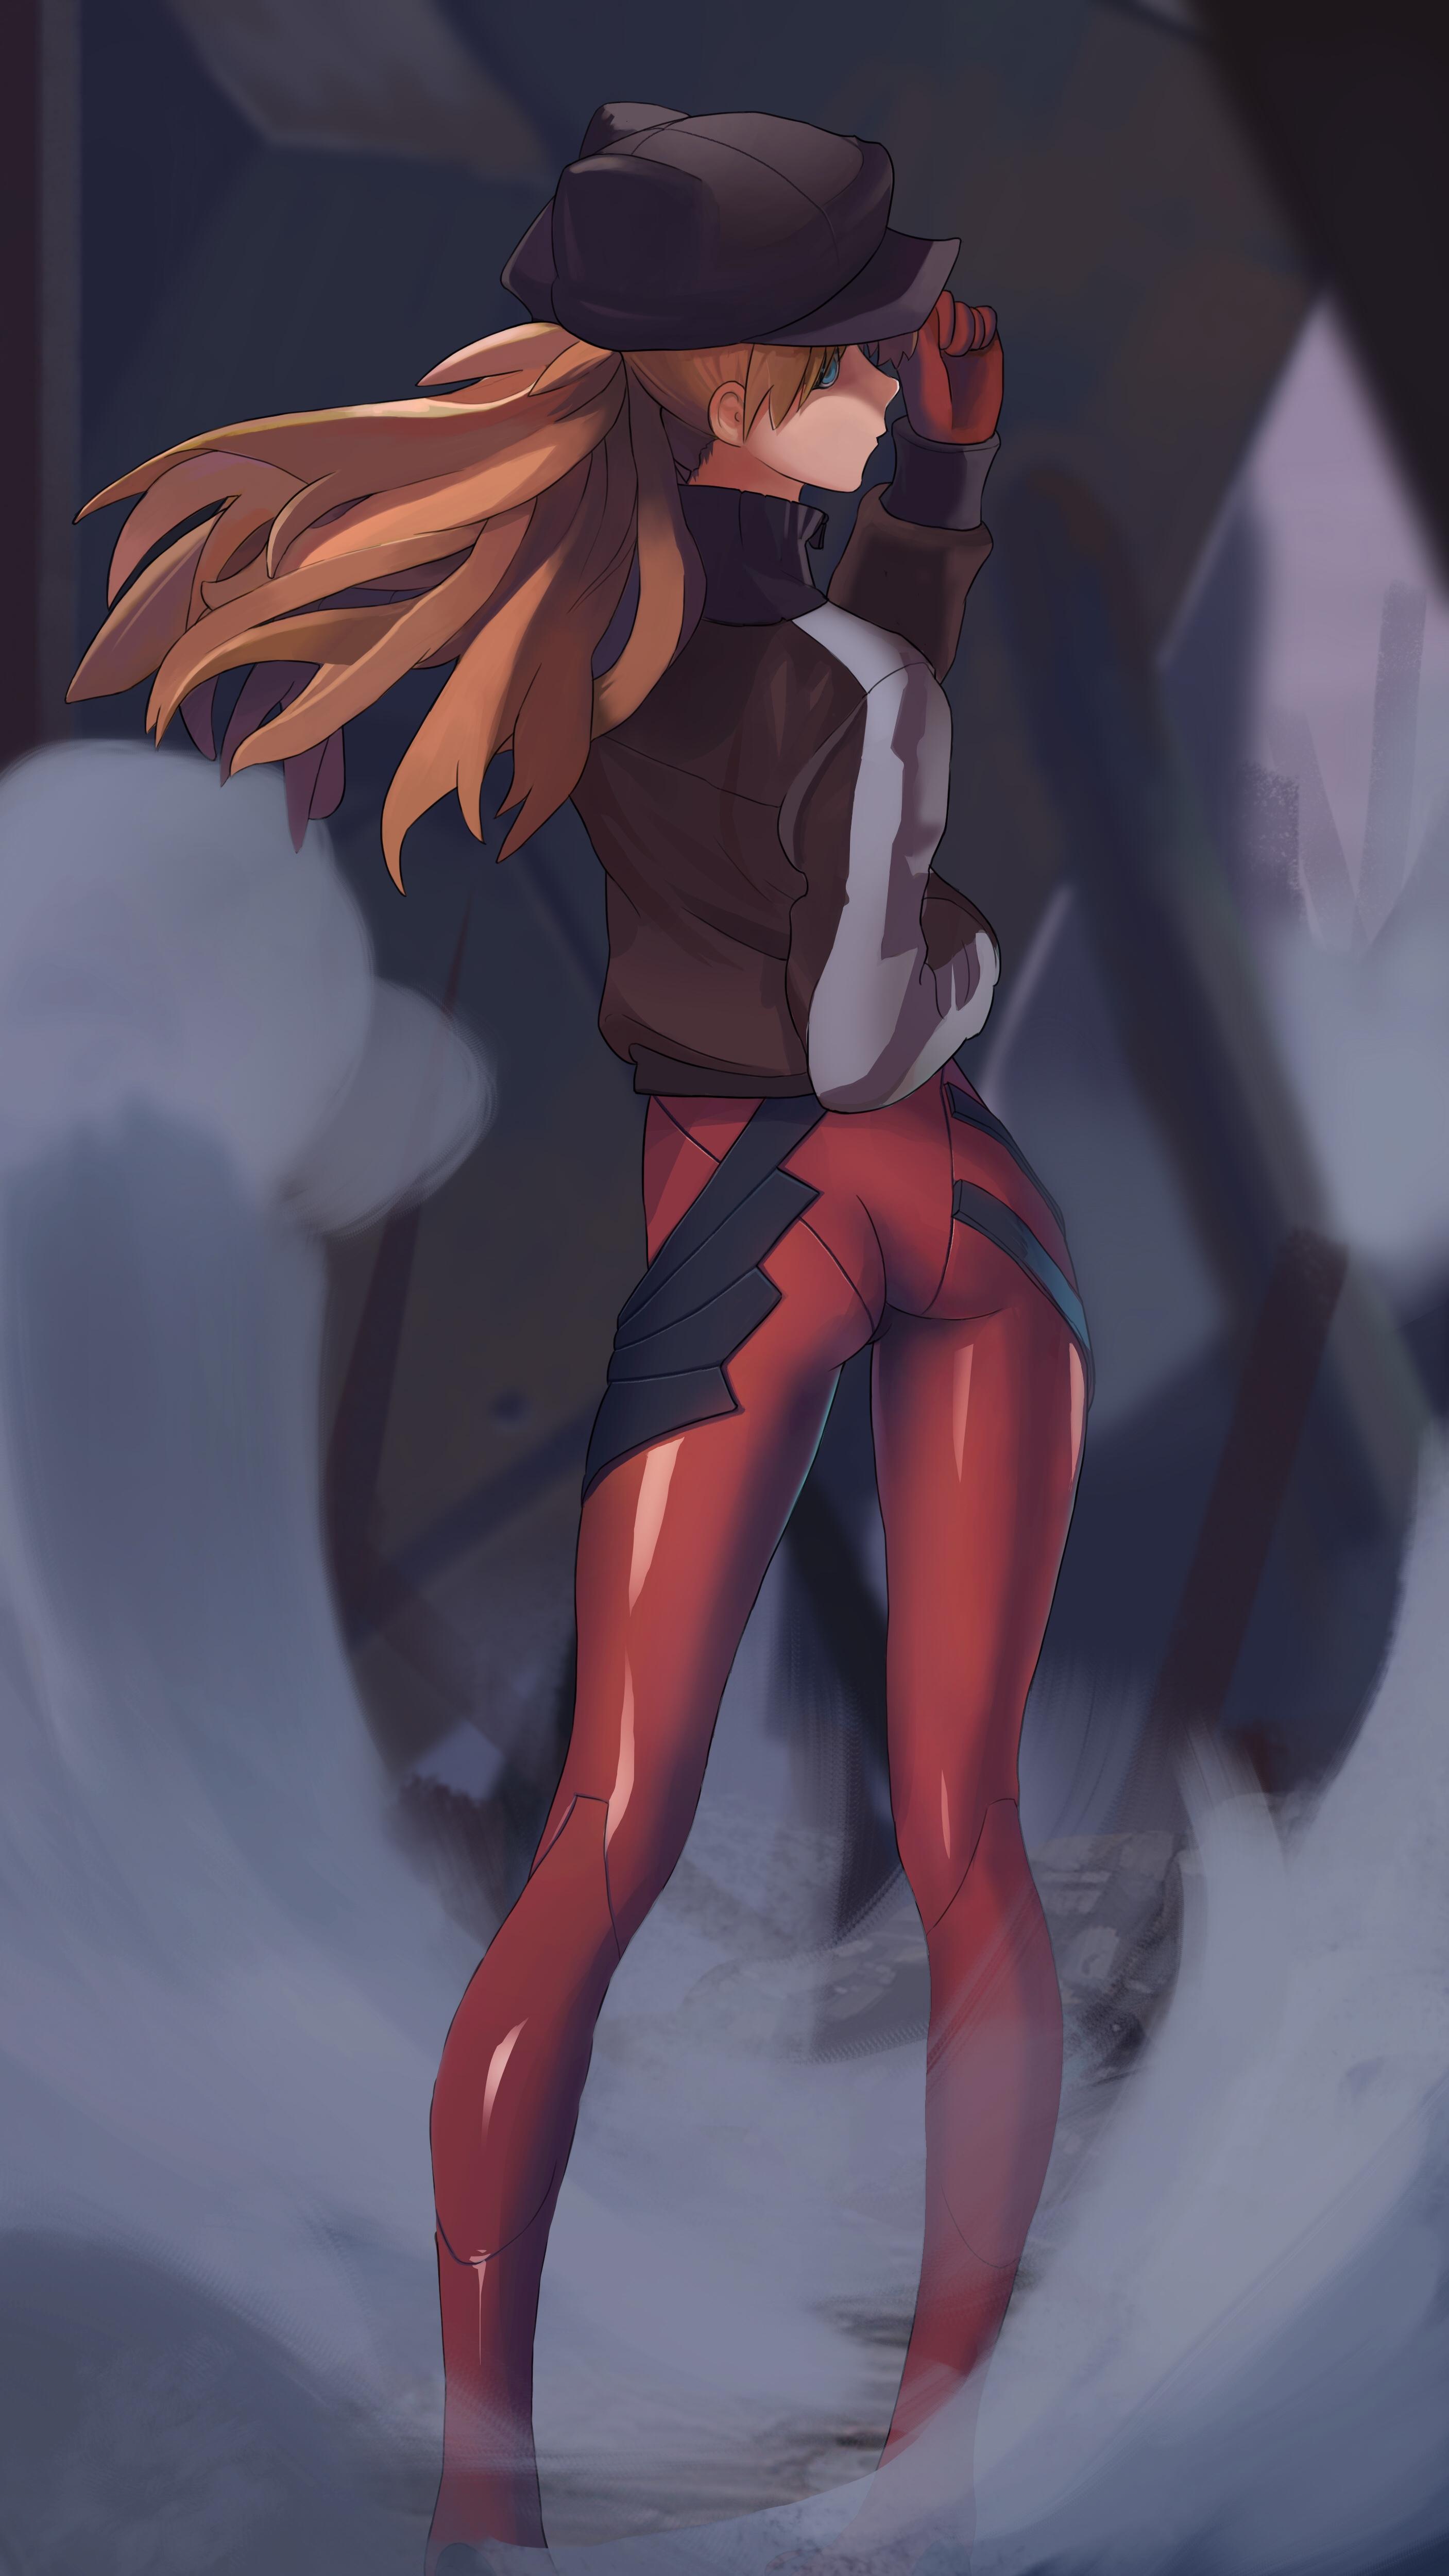 Anime 2813x5000 Asuka Langley Soryu Neon Genesis Evangelion women sweatshirts anime girls fan art digital art illustration 2D ass